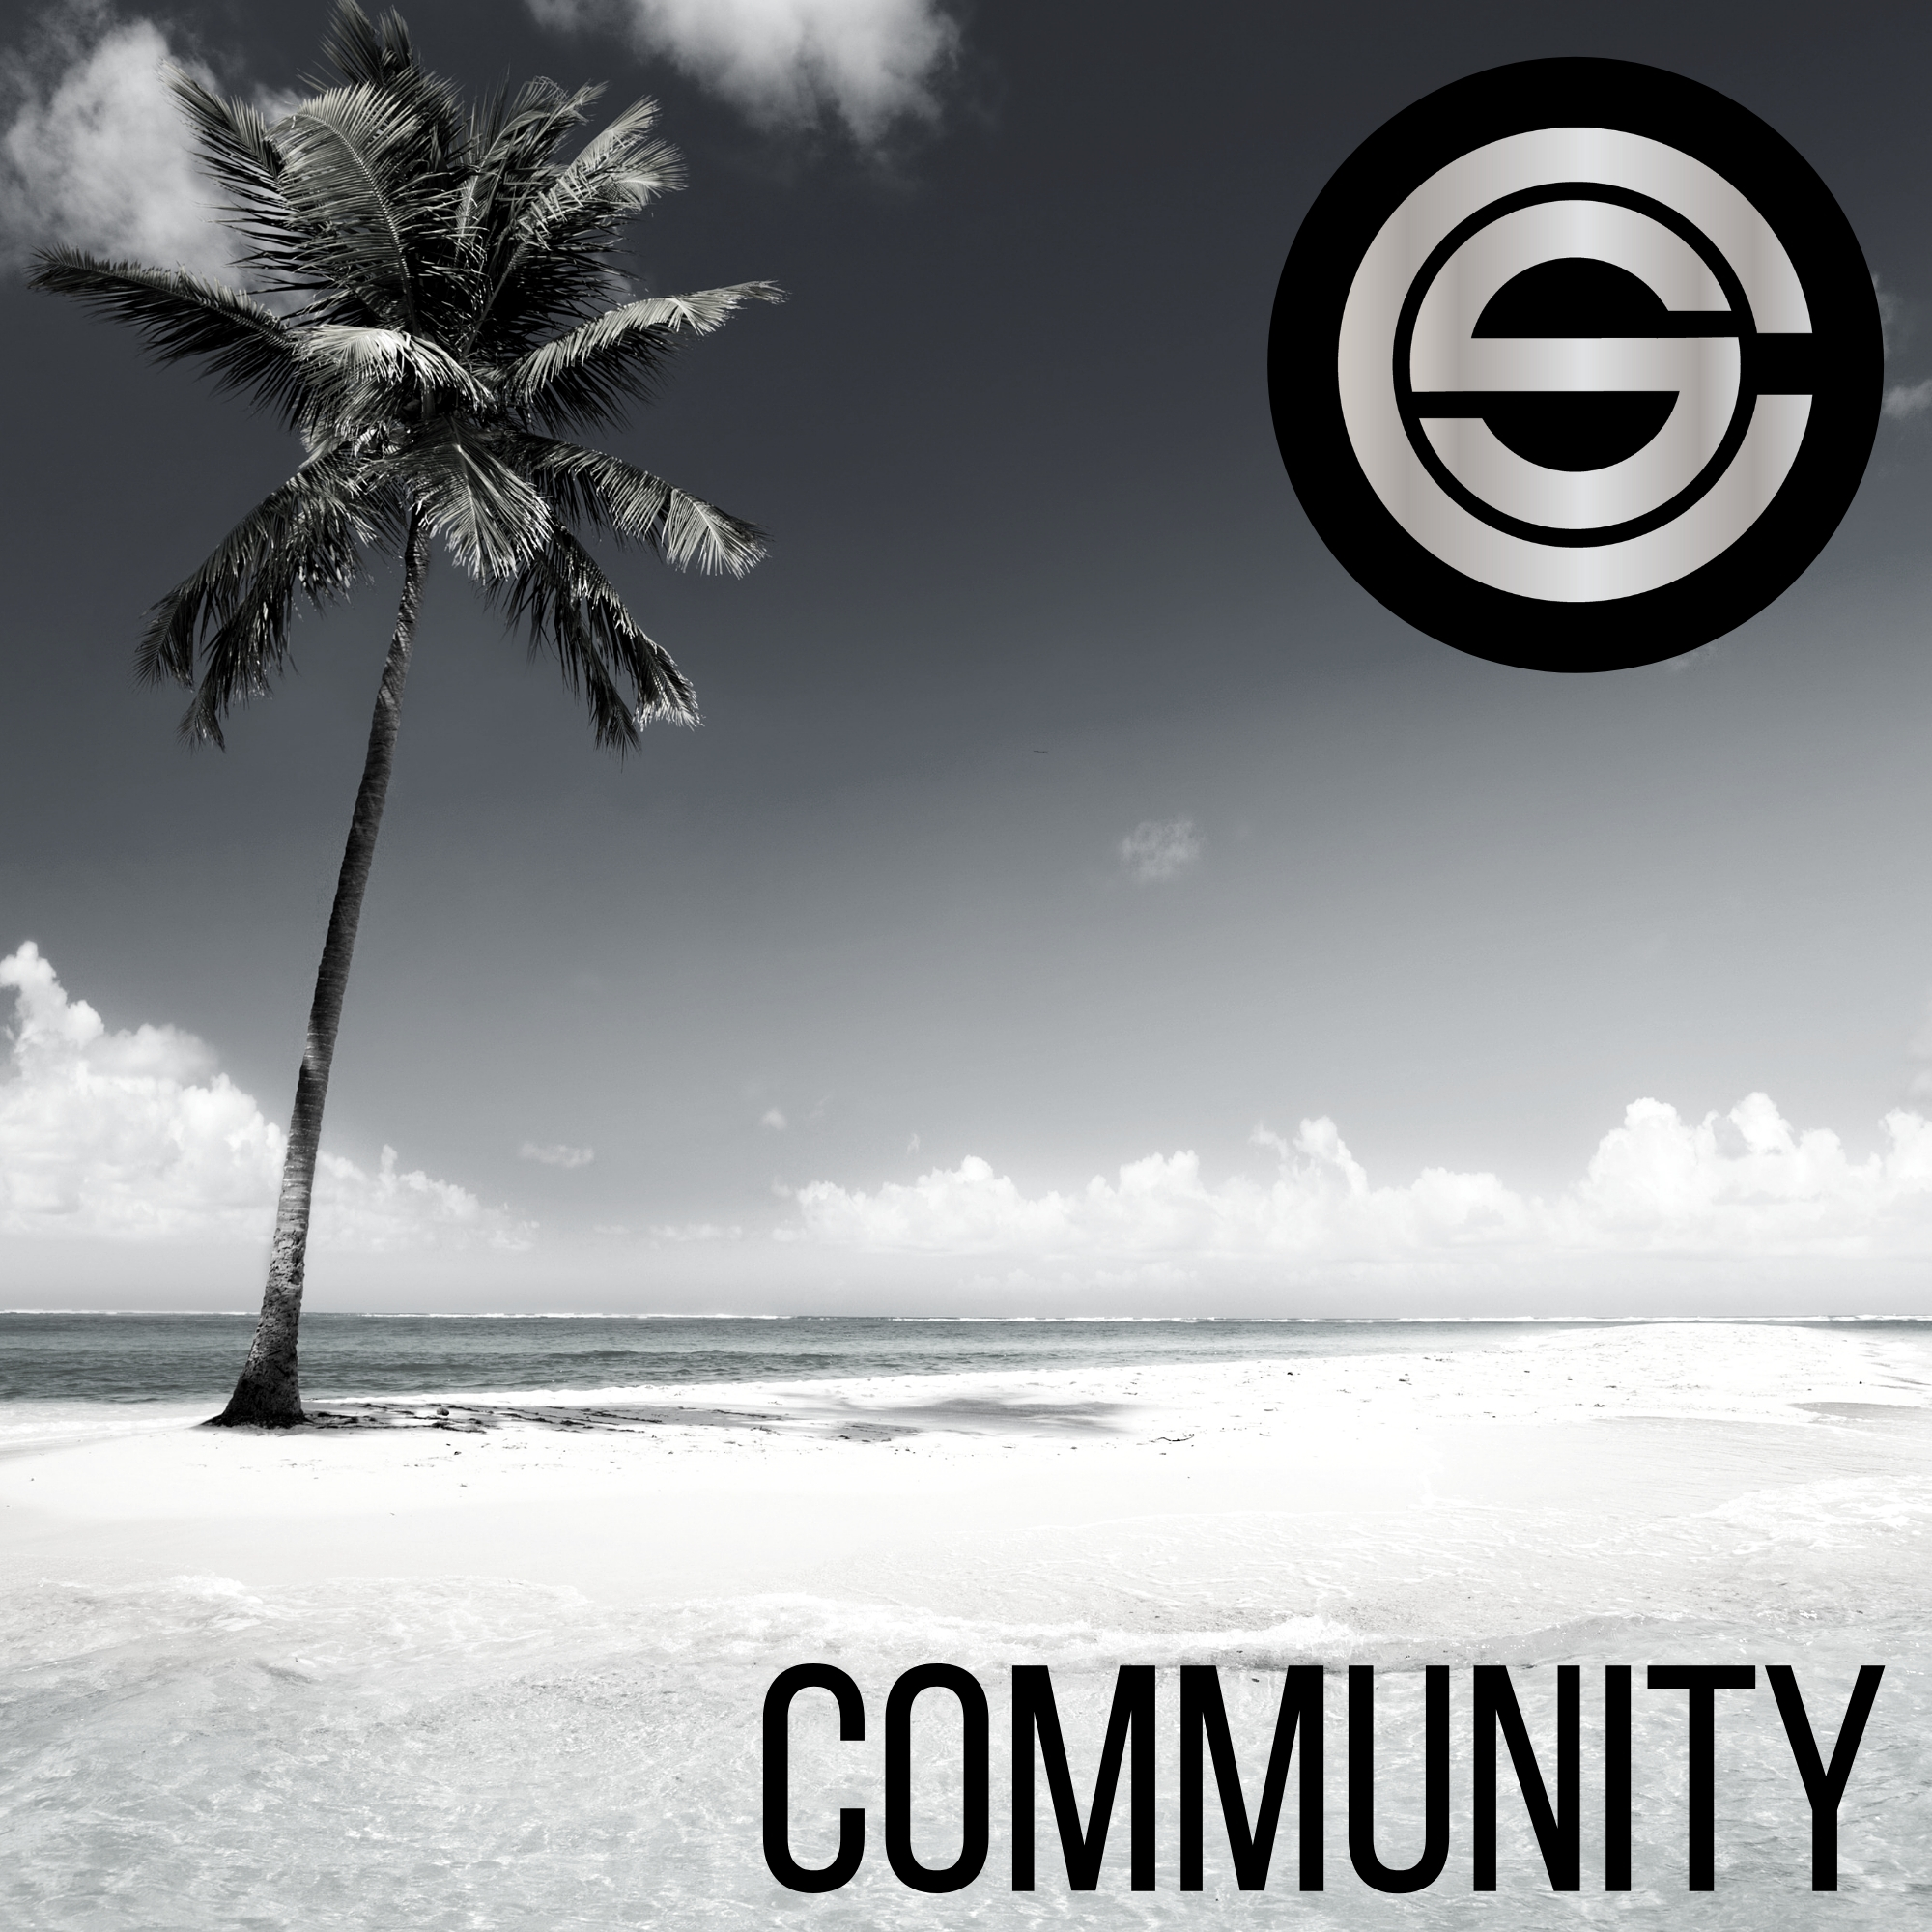 Community by Chris Swan